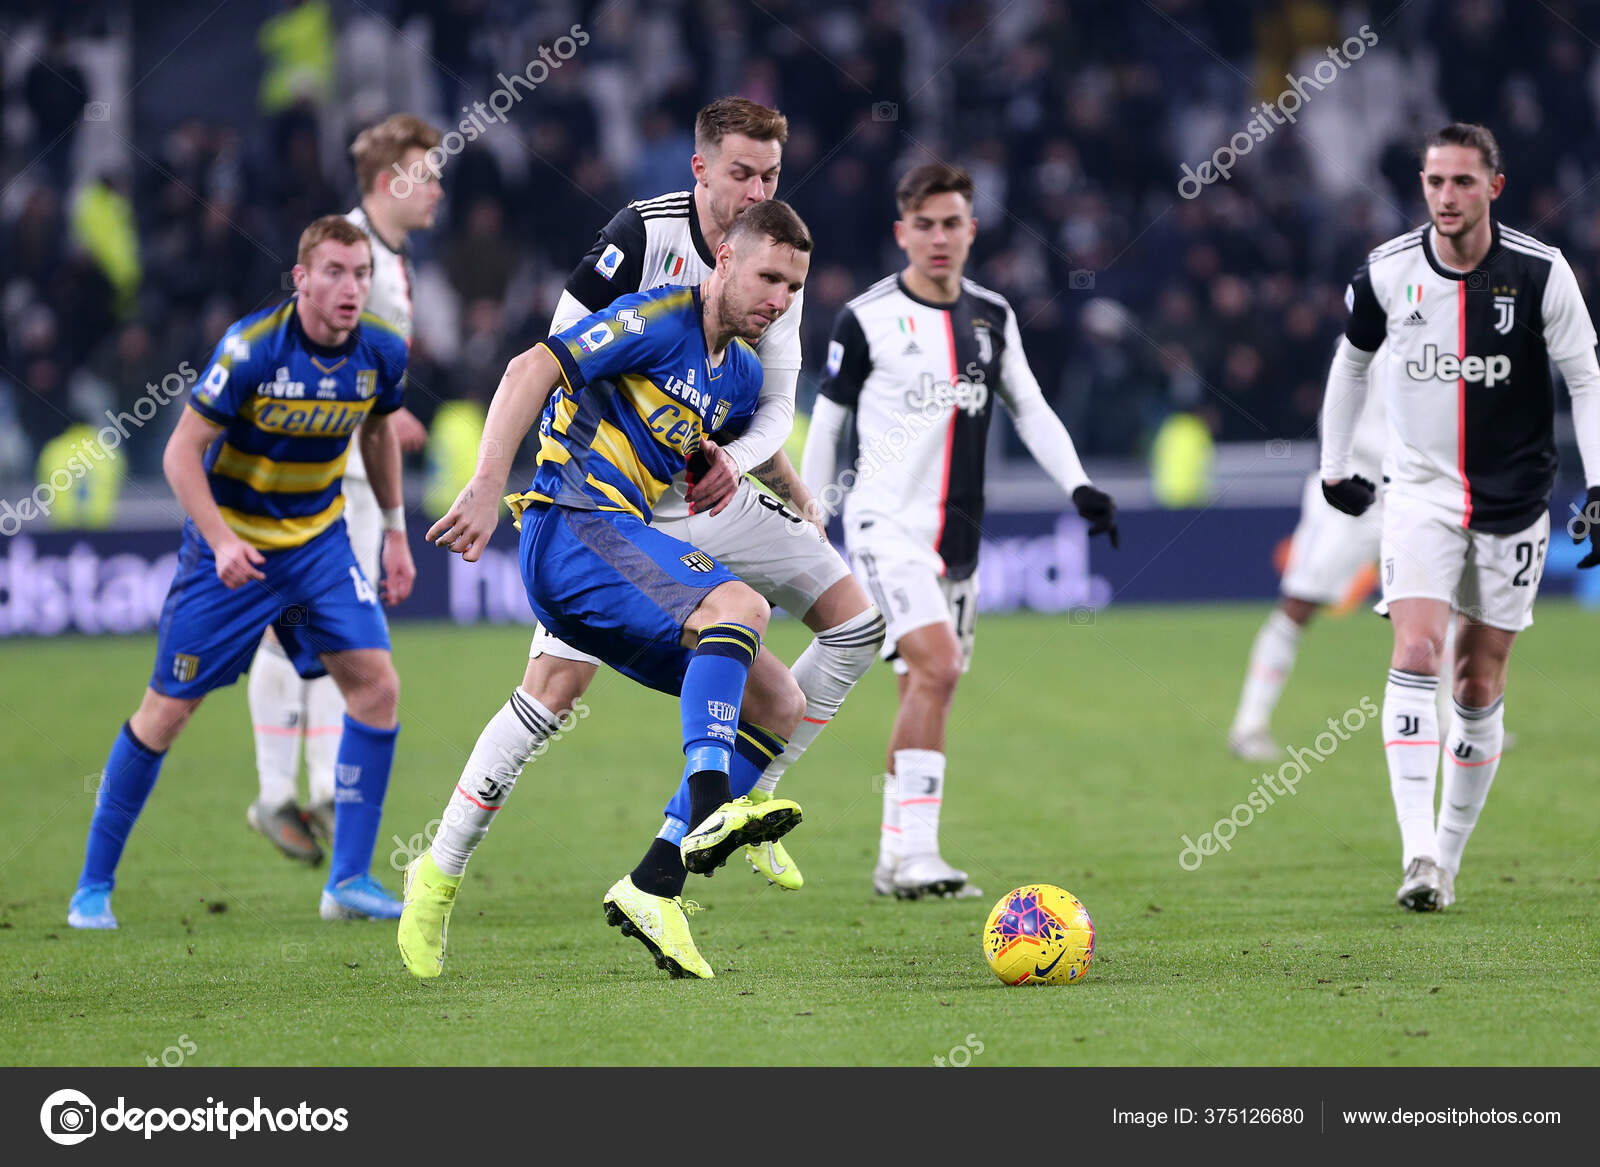 Juventus Gegen Parma